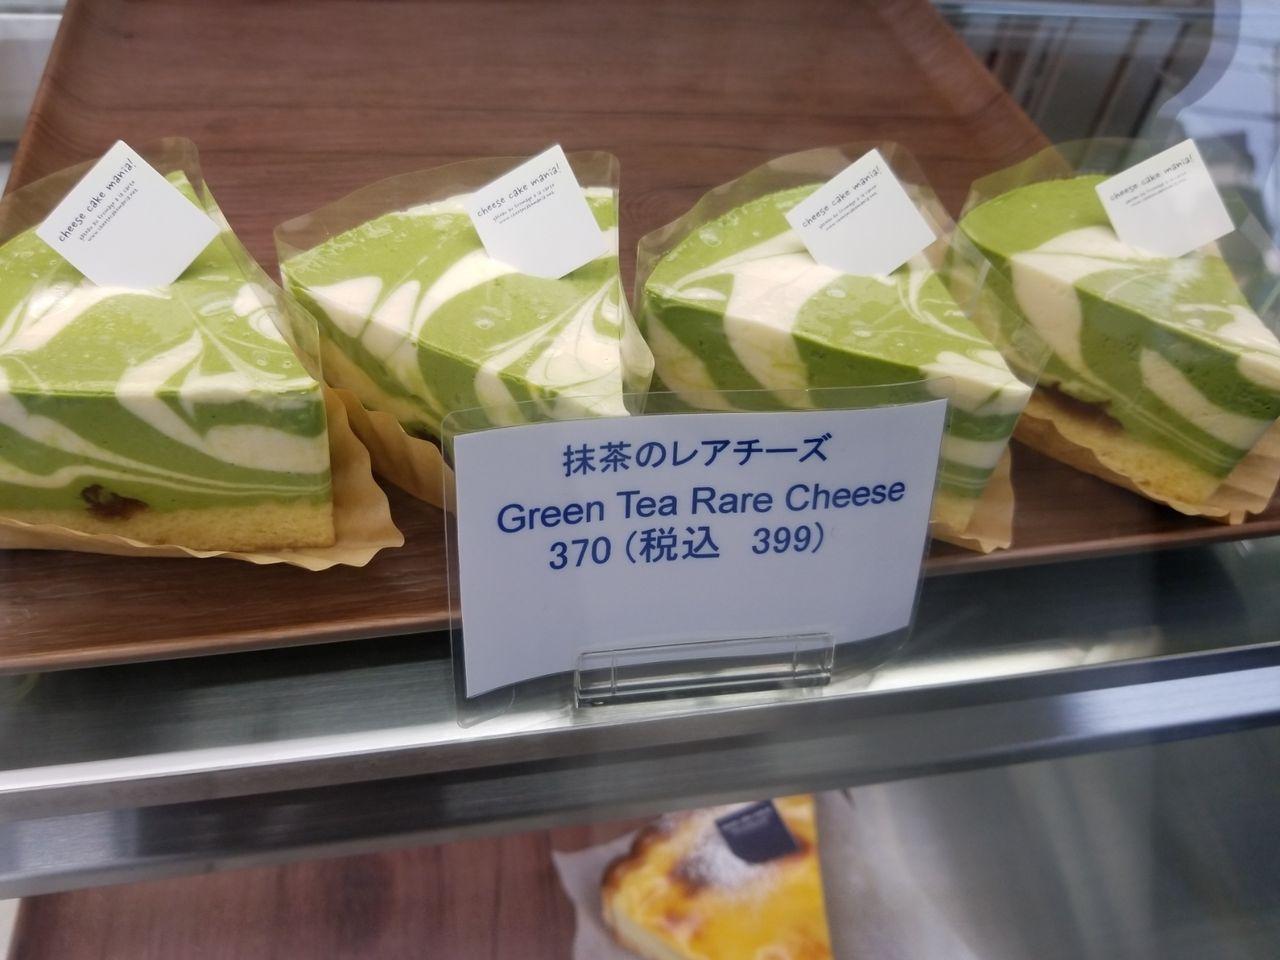 cheese cake mania!(チーズケーキマニア!)抹茶のレアチーズ